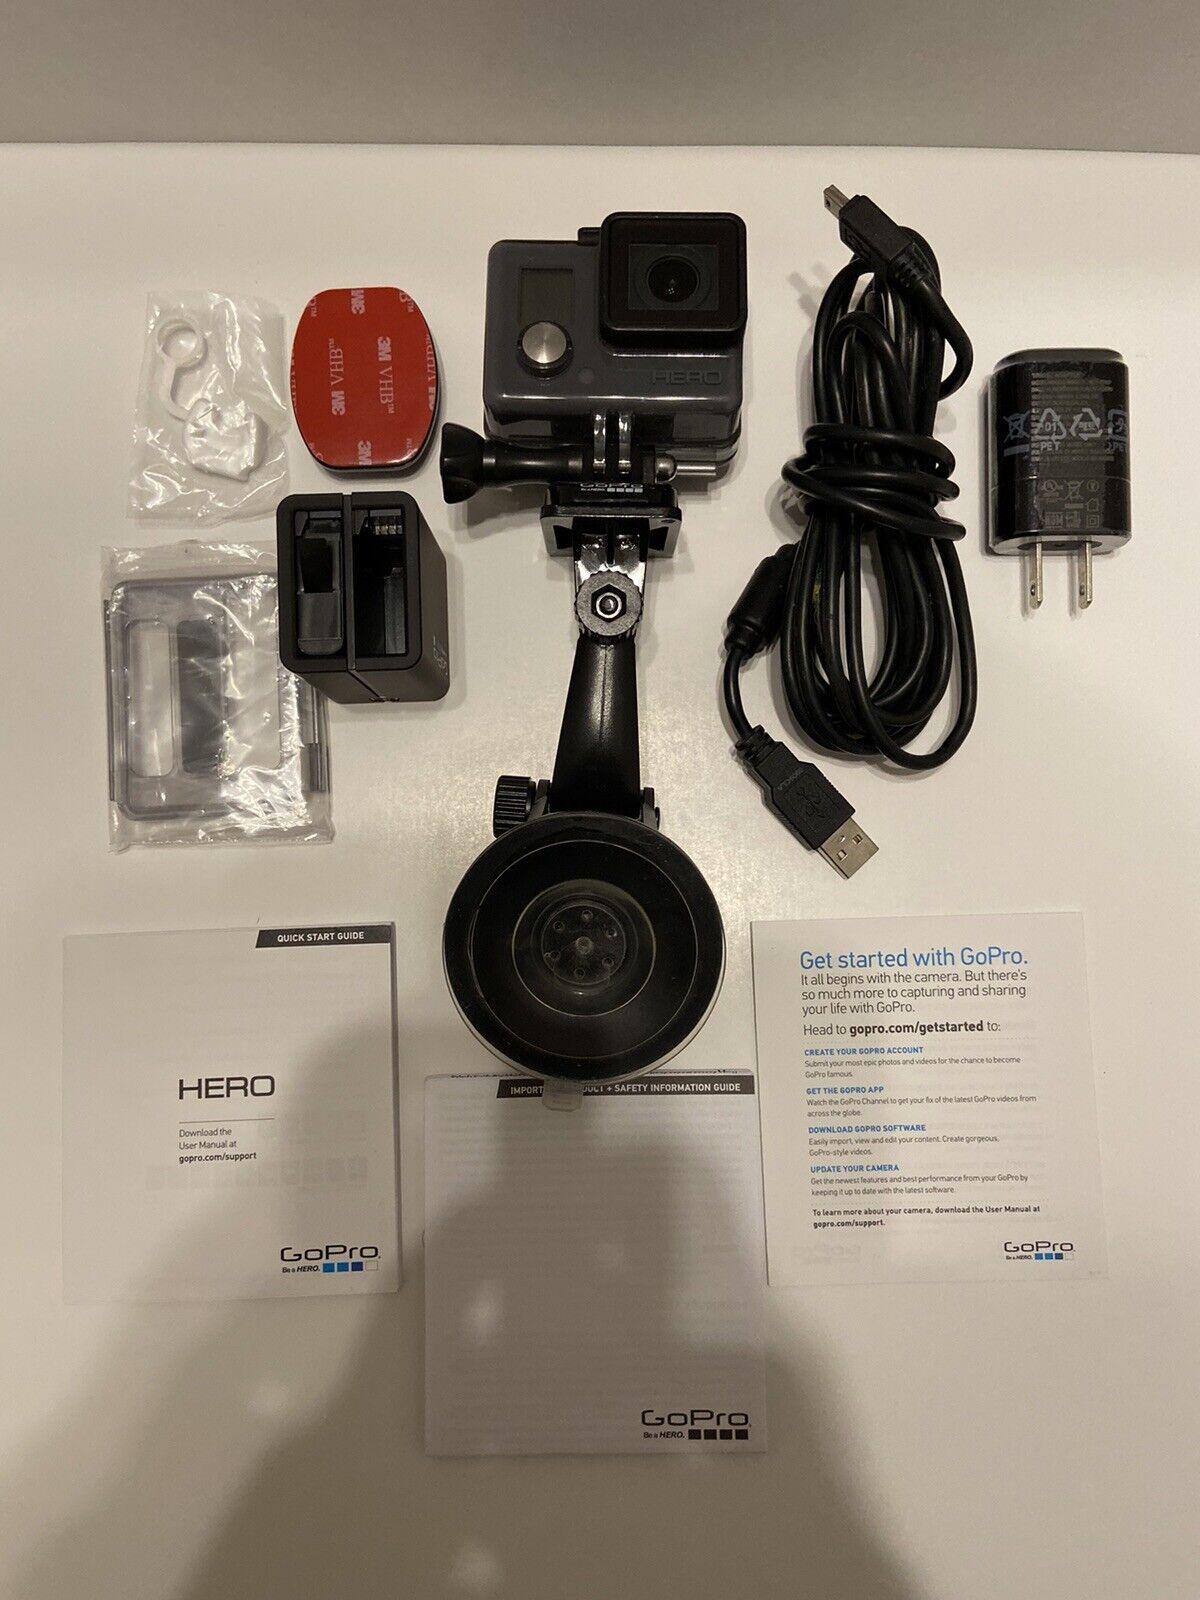 s l1600 - GoPro HERO Camcorder - Gray